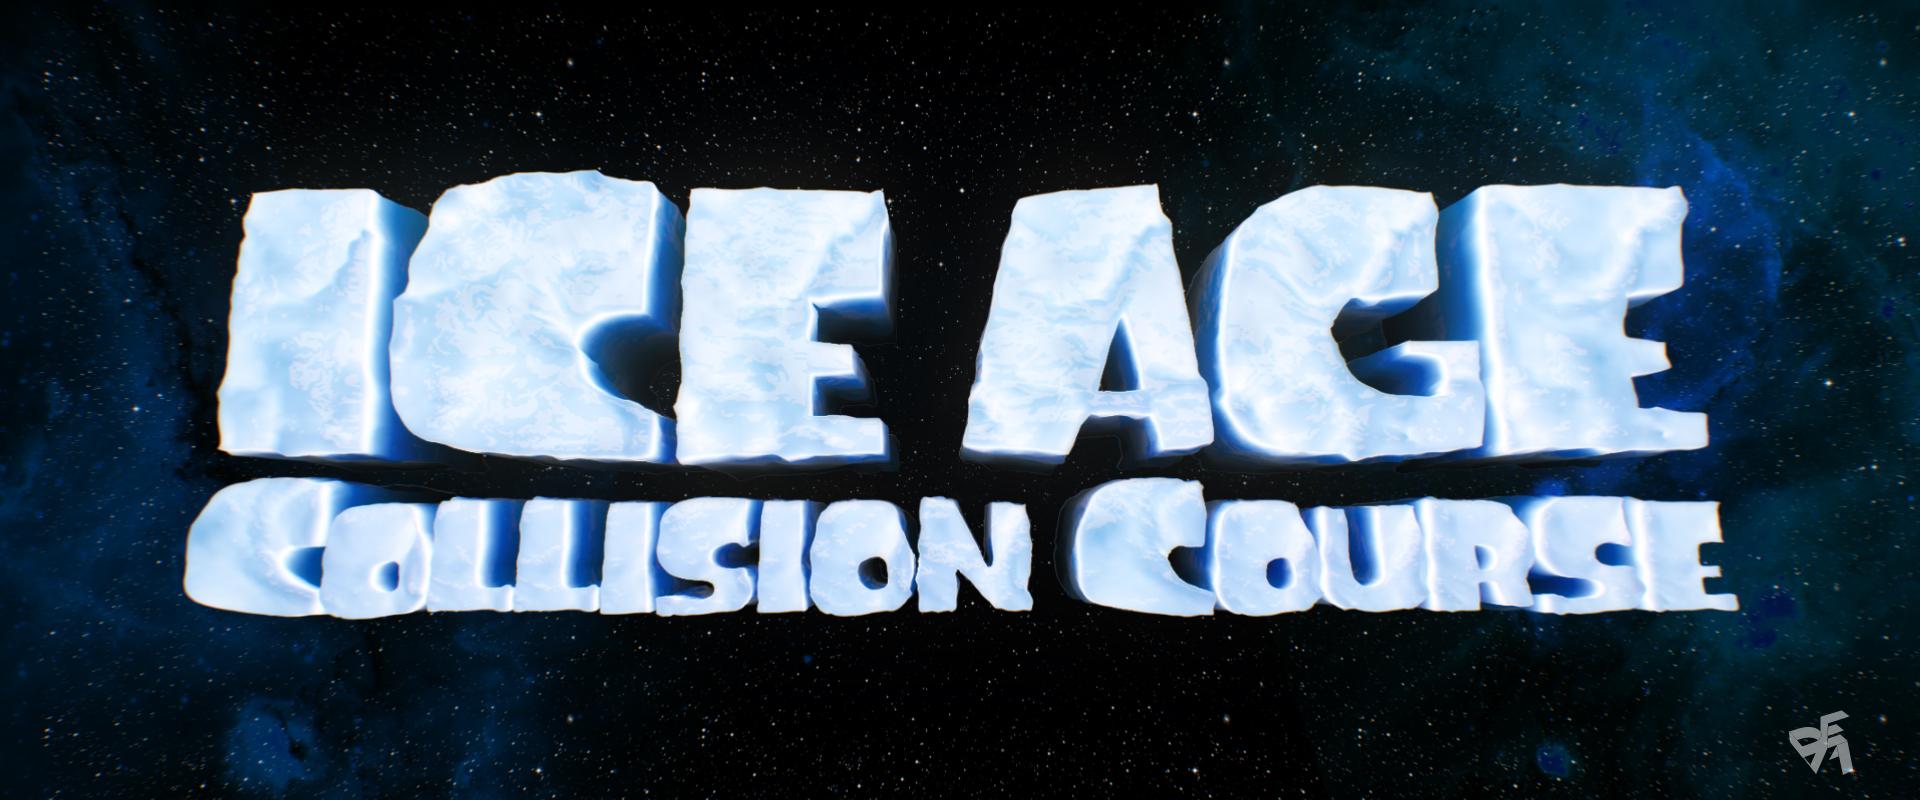 IceAge5-STYLEFRAME_01.jpg